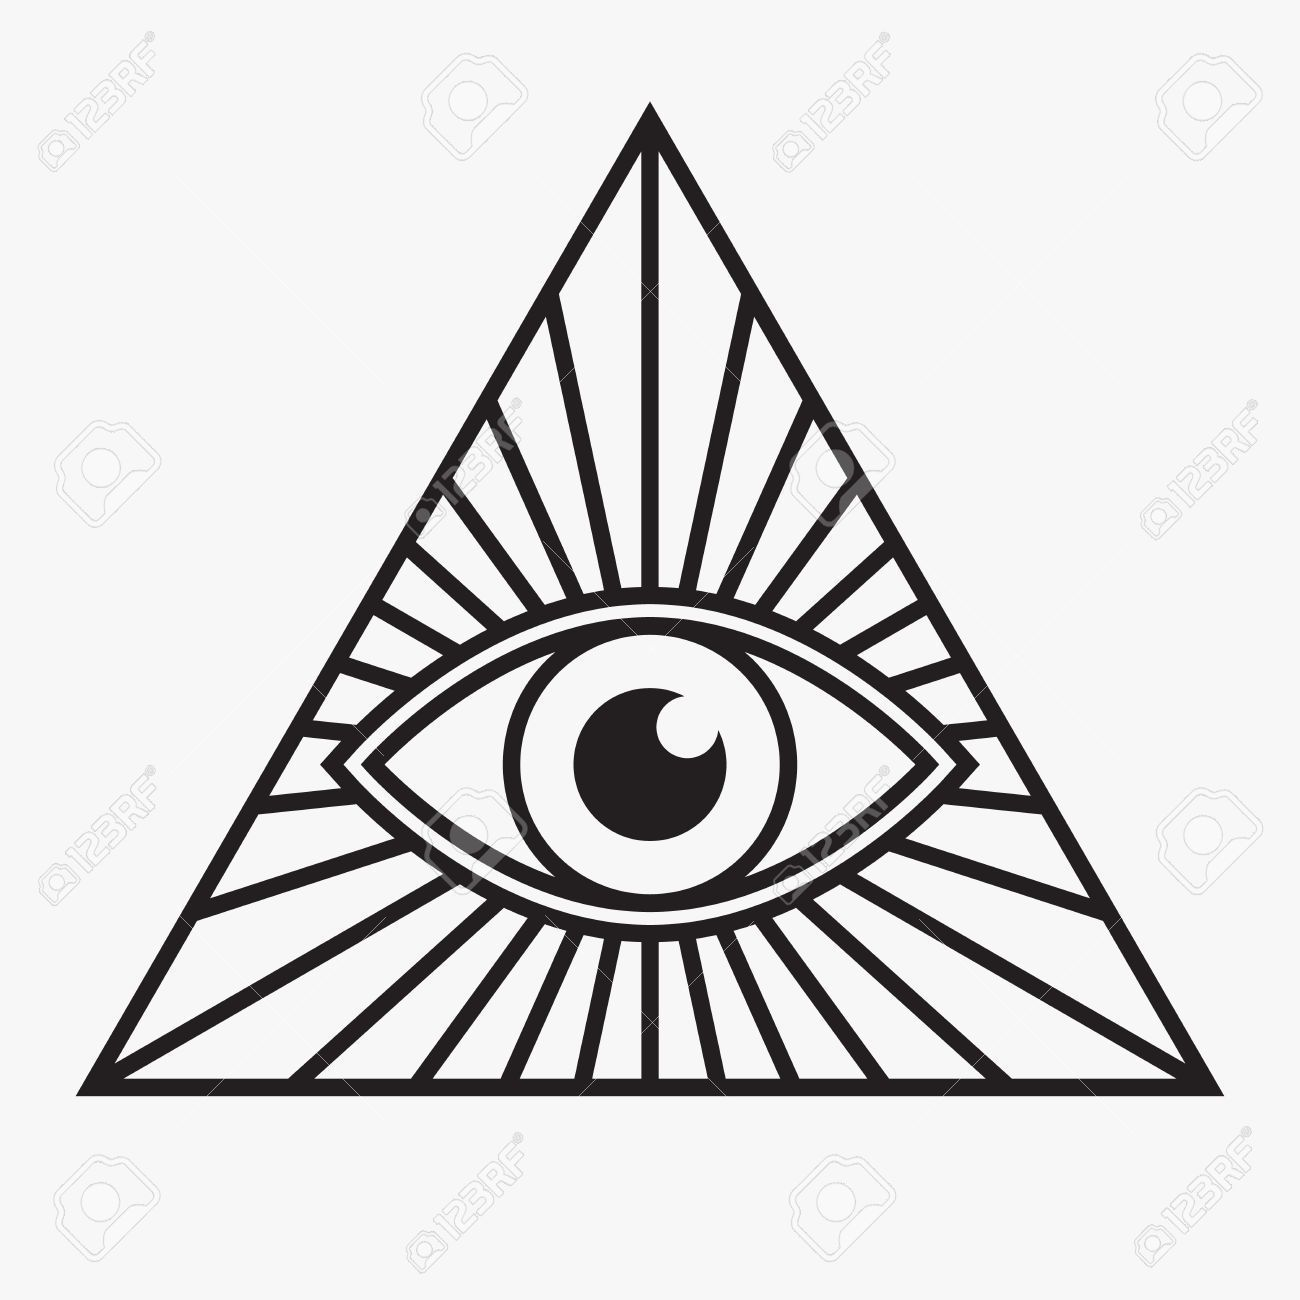 Stock Vector Eye symbol, All seeing eye tattoo, All